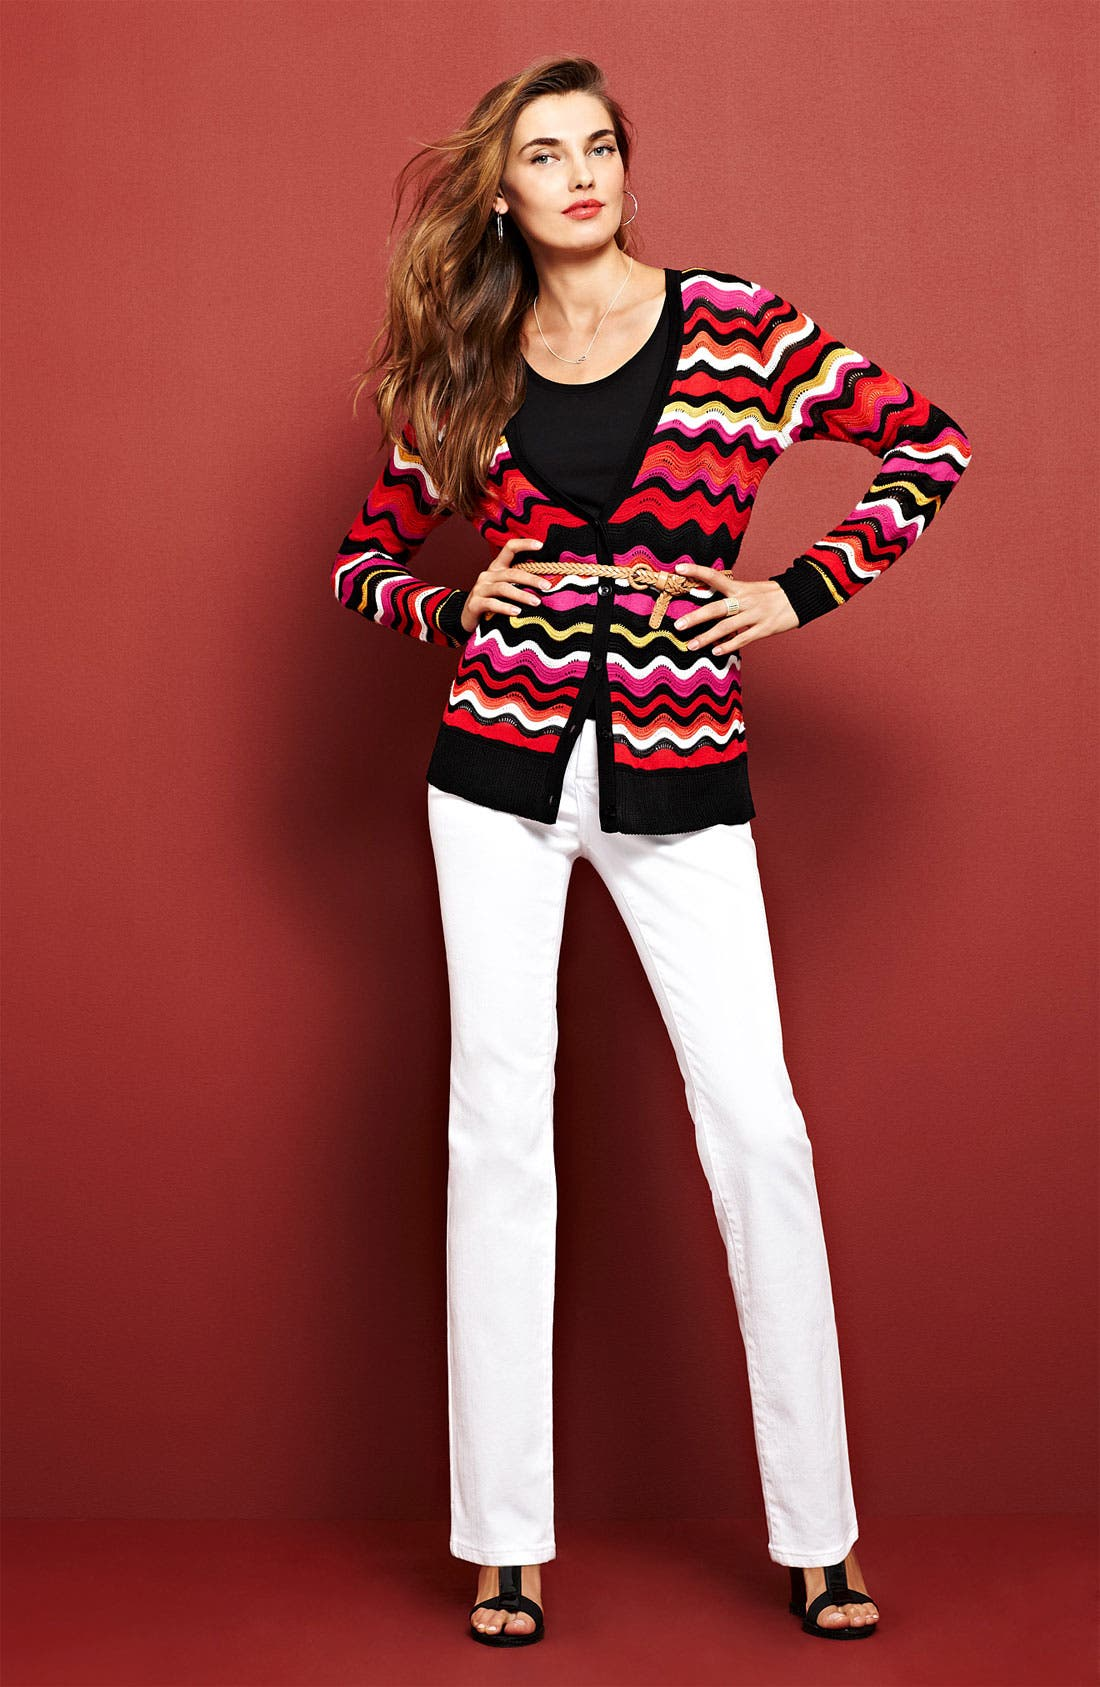 Alternate Image 1 Selected - Chaus Cardigan, Nic + Zoe Tank & NYDJ 'Marilyn' Jeans